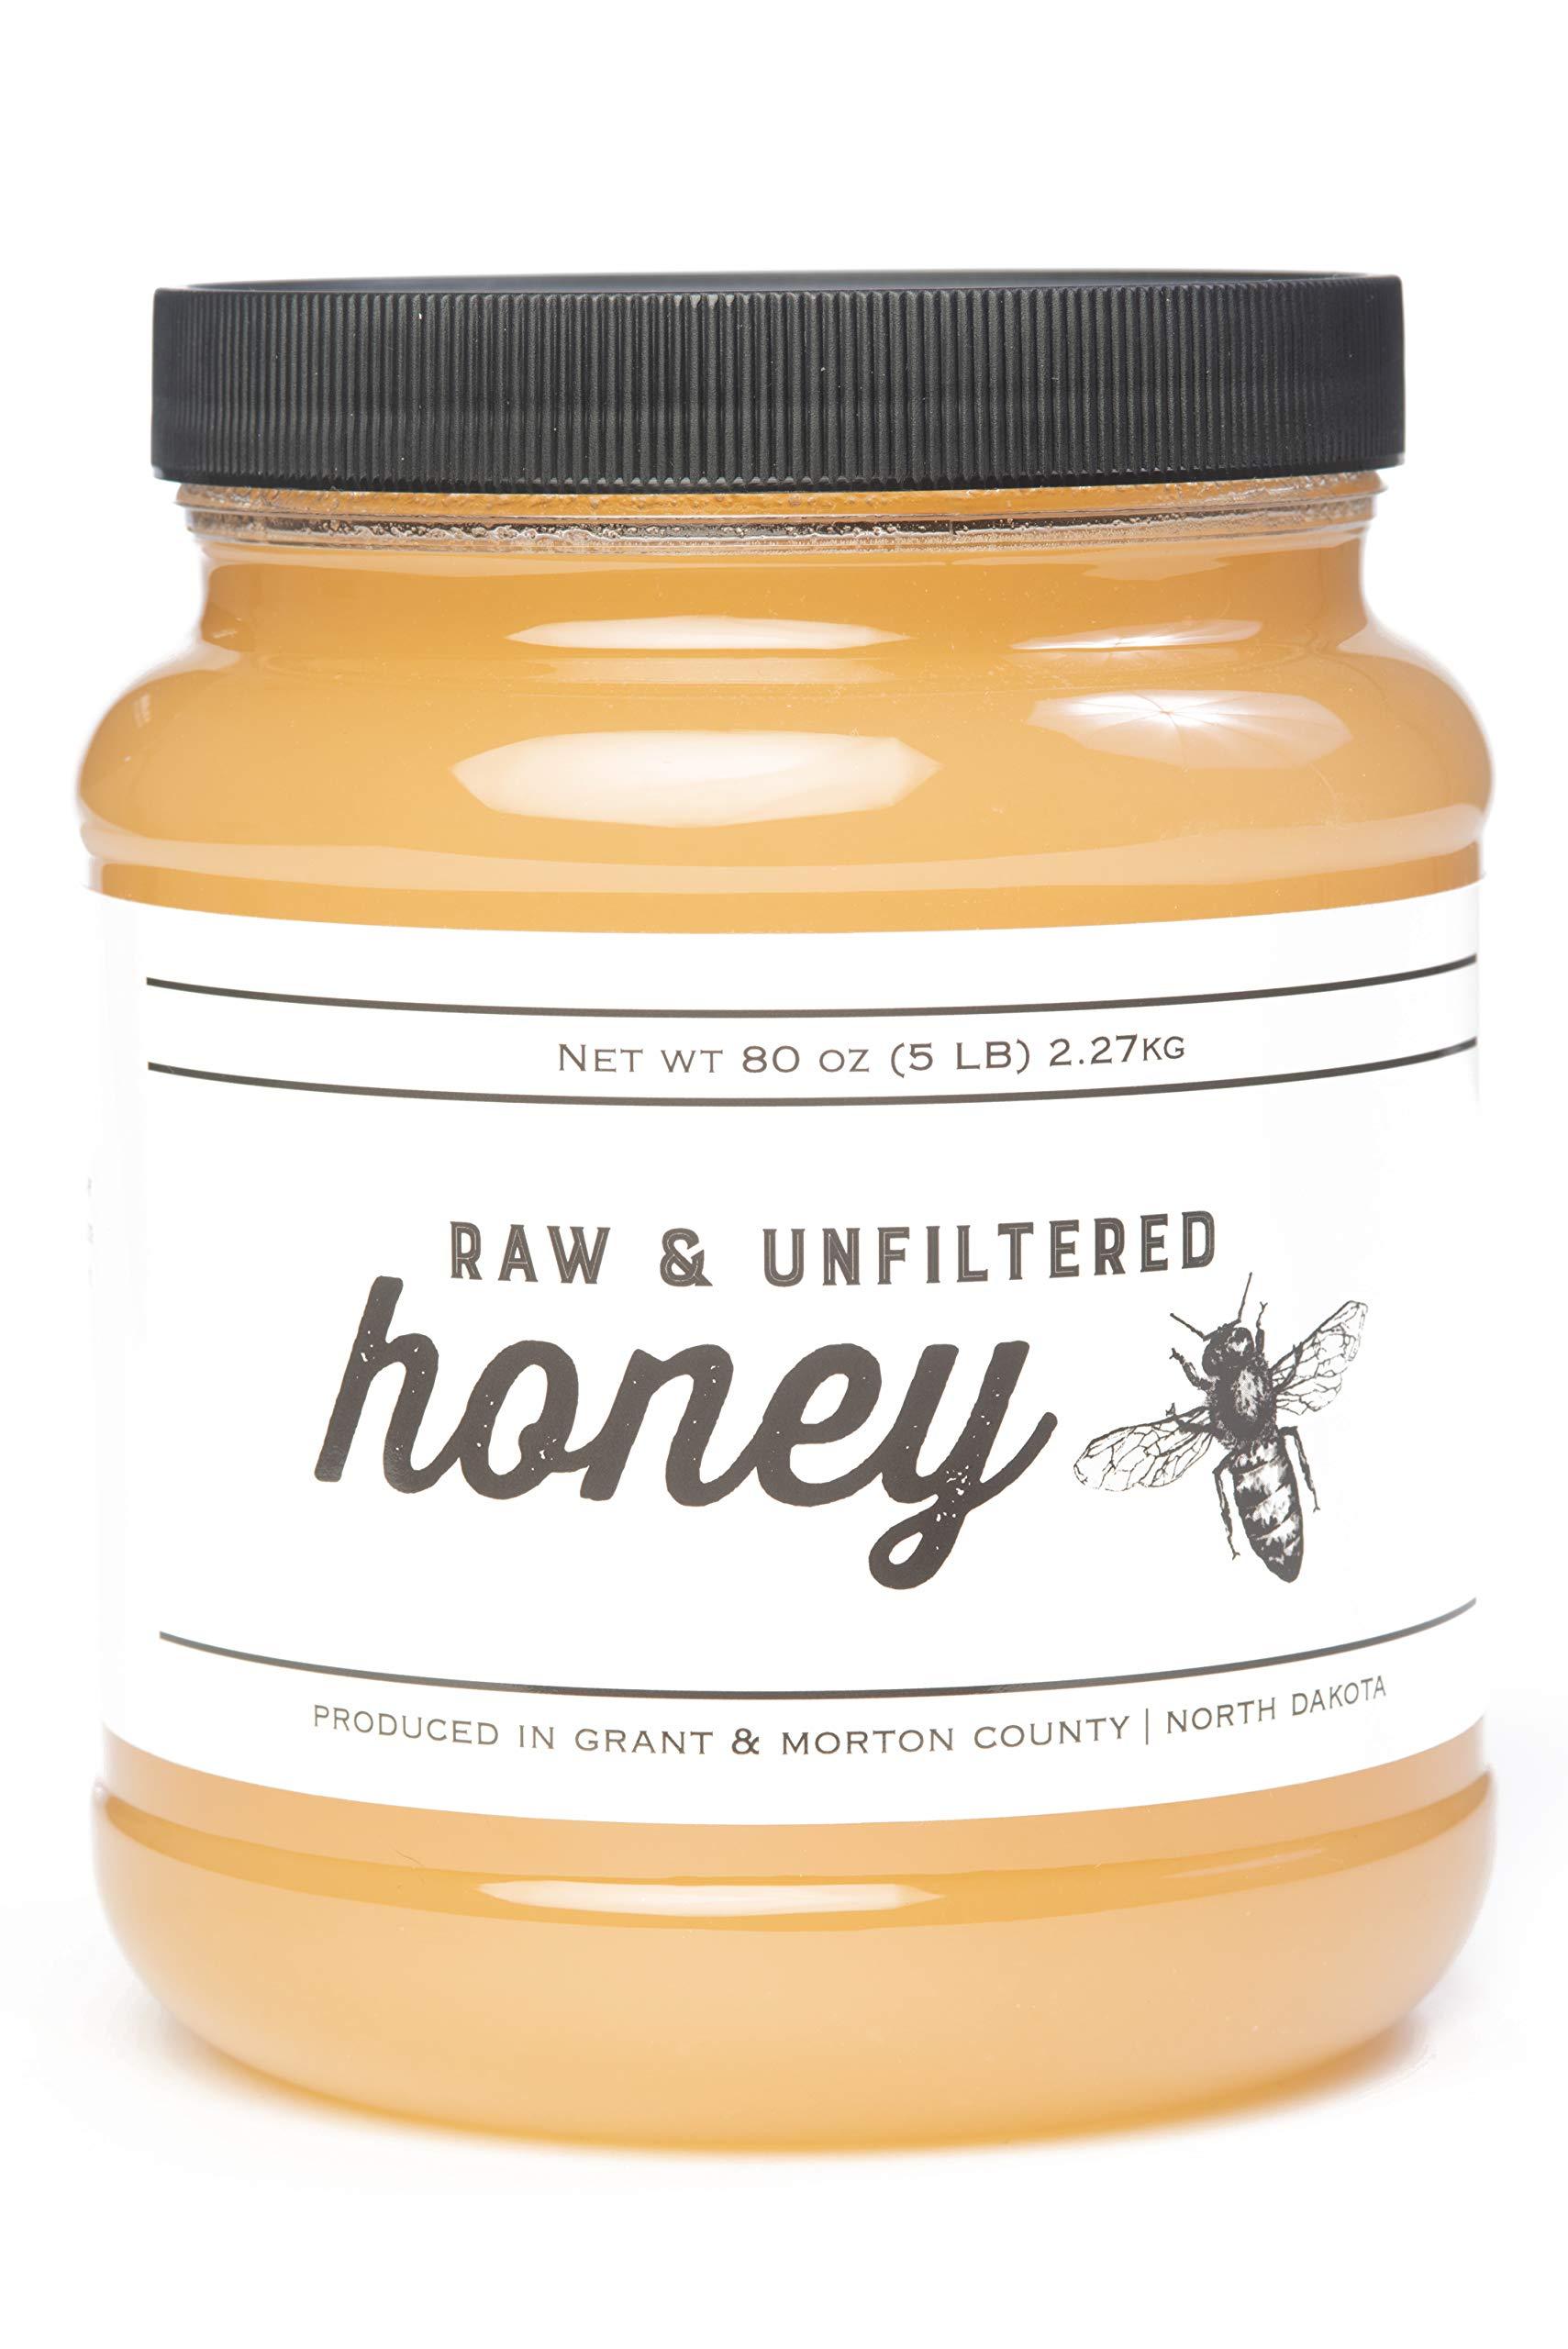 TJO Bees Raw and Unfiltered Honey (5 LB (80 OZ) Jar)